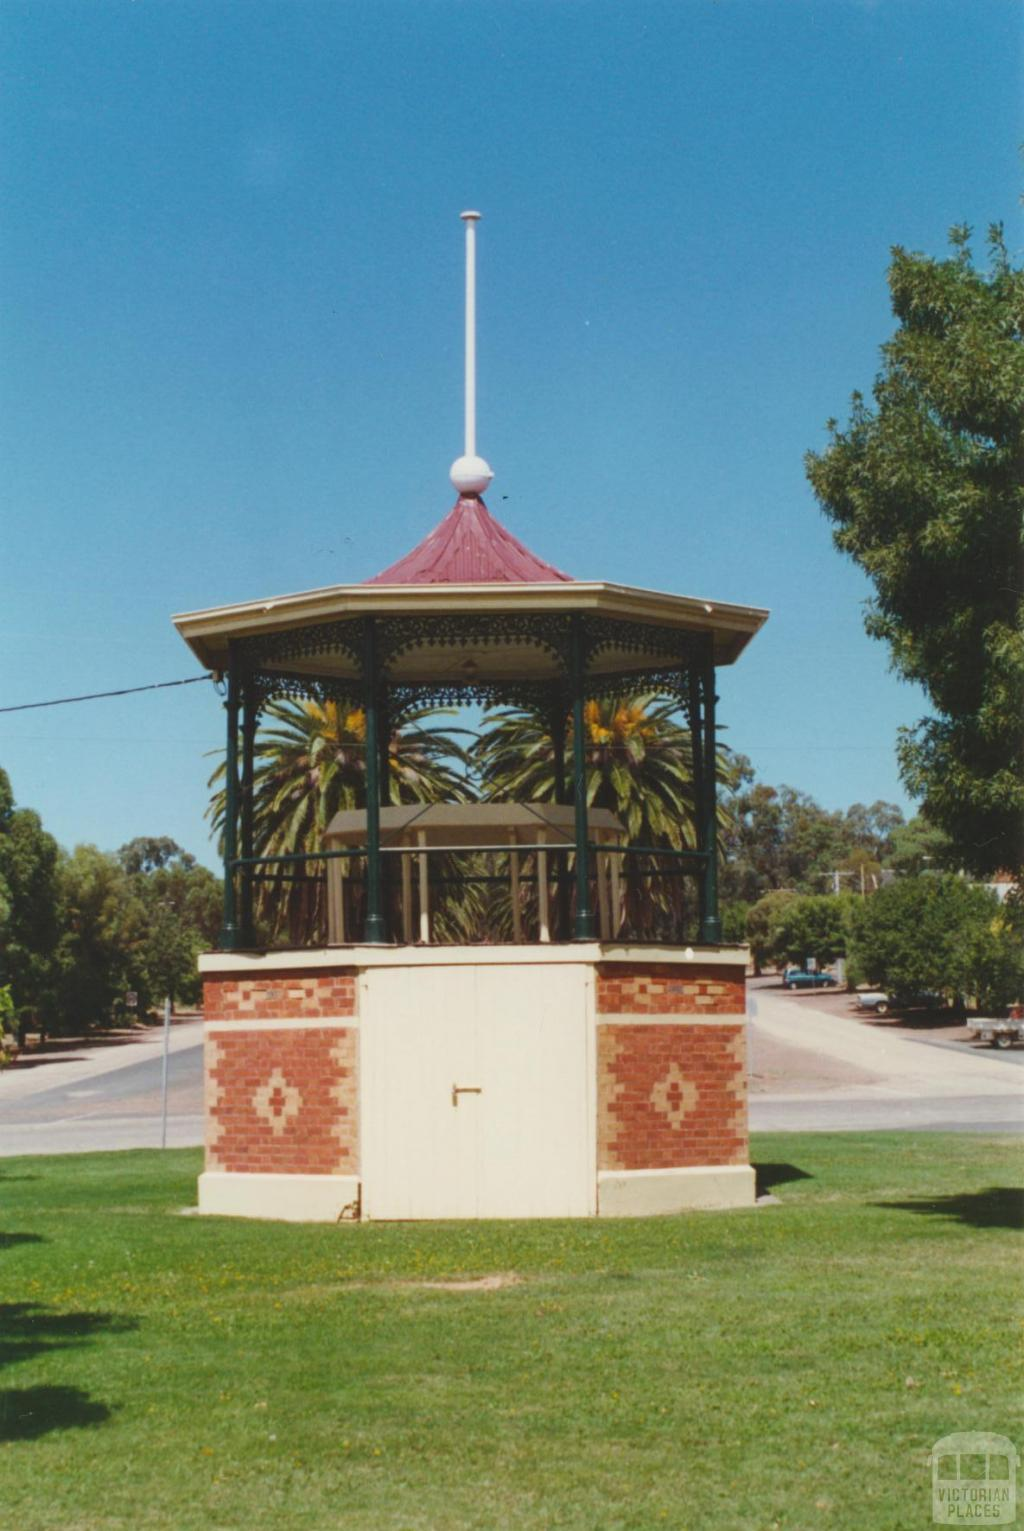 Rushworth, 2001